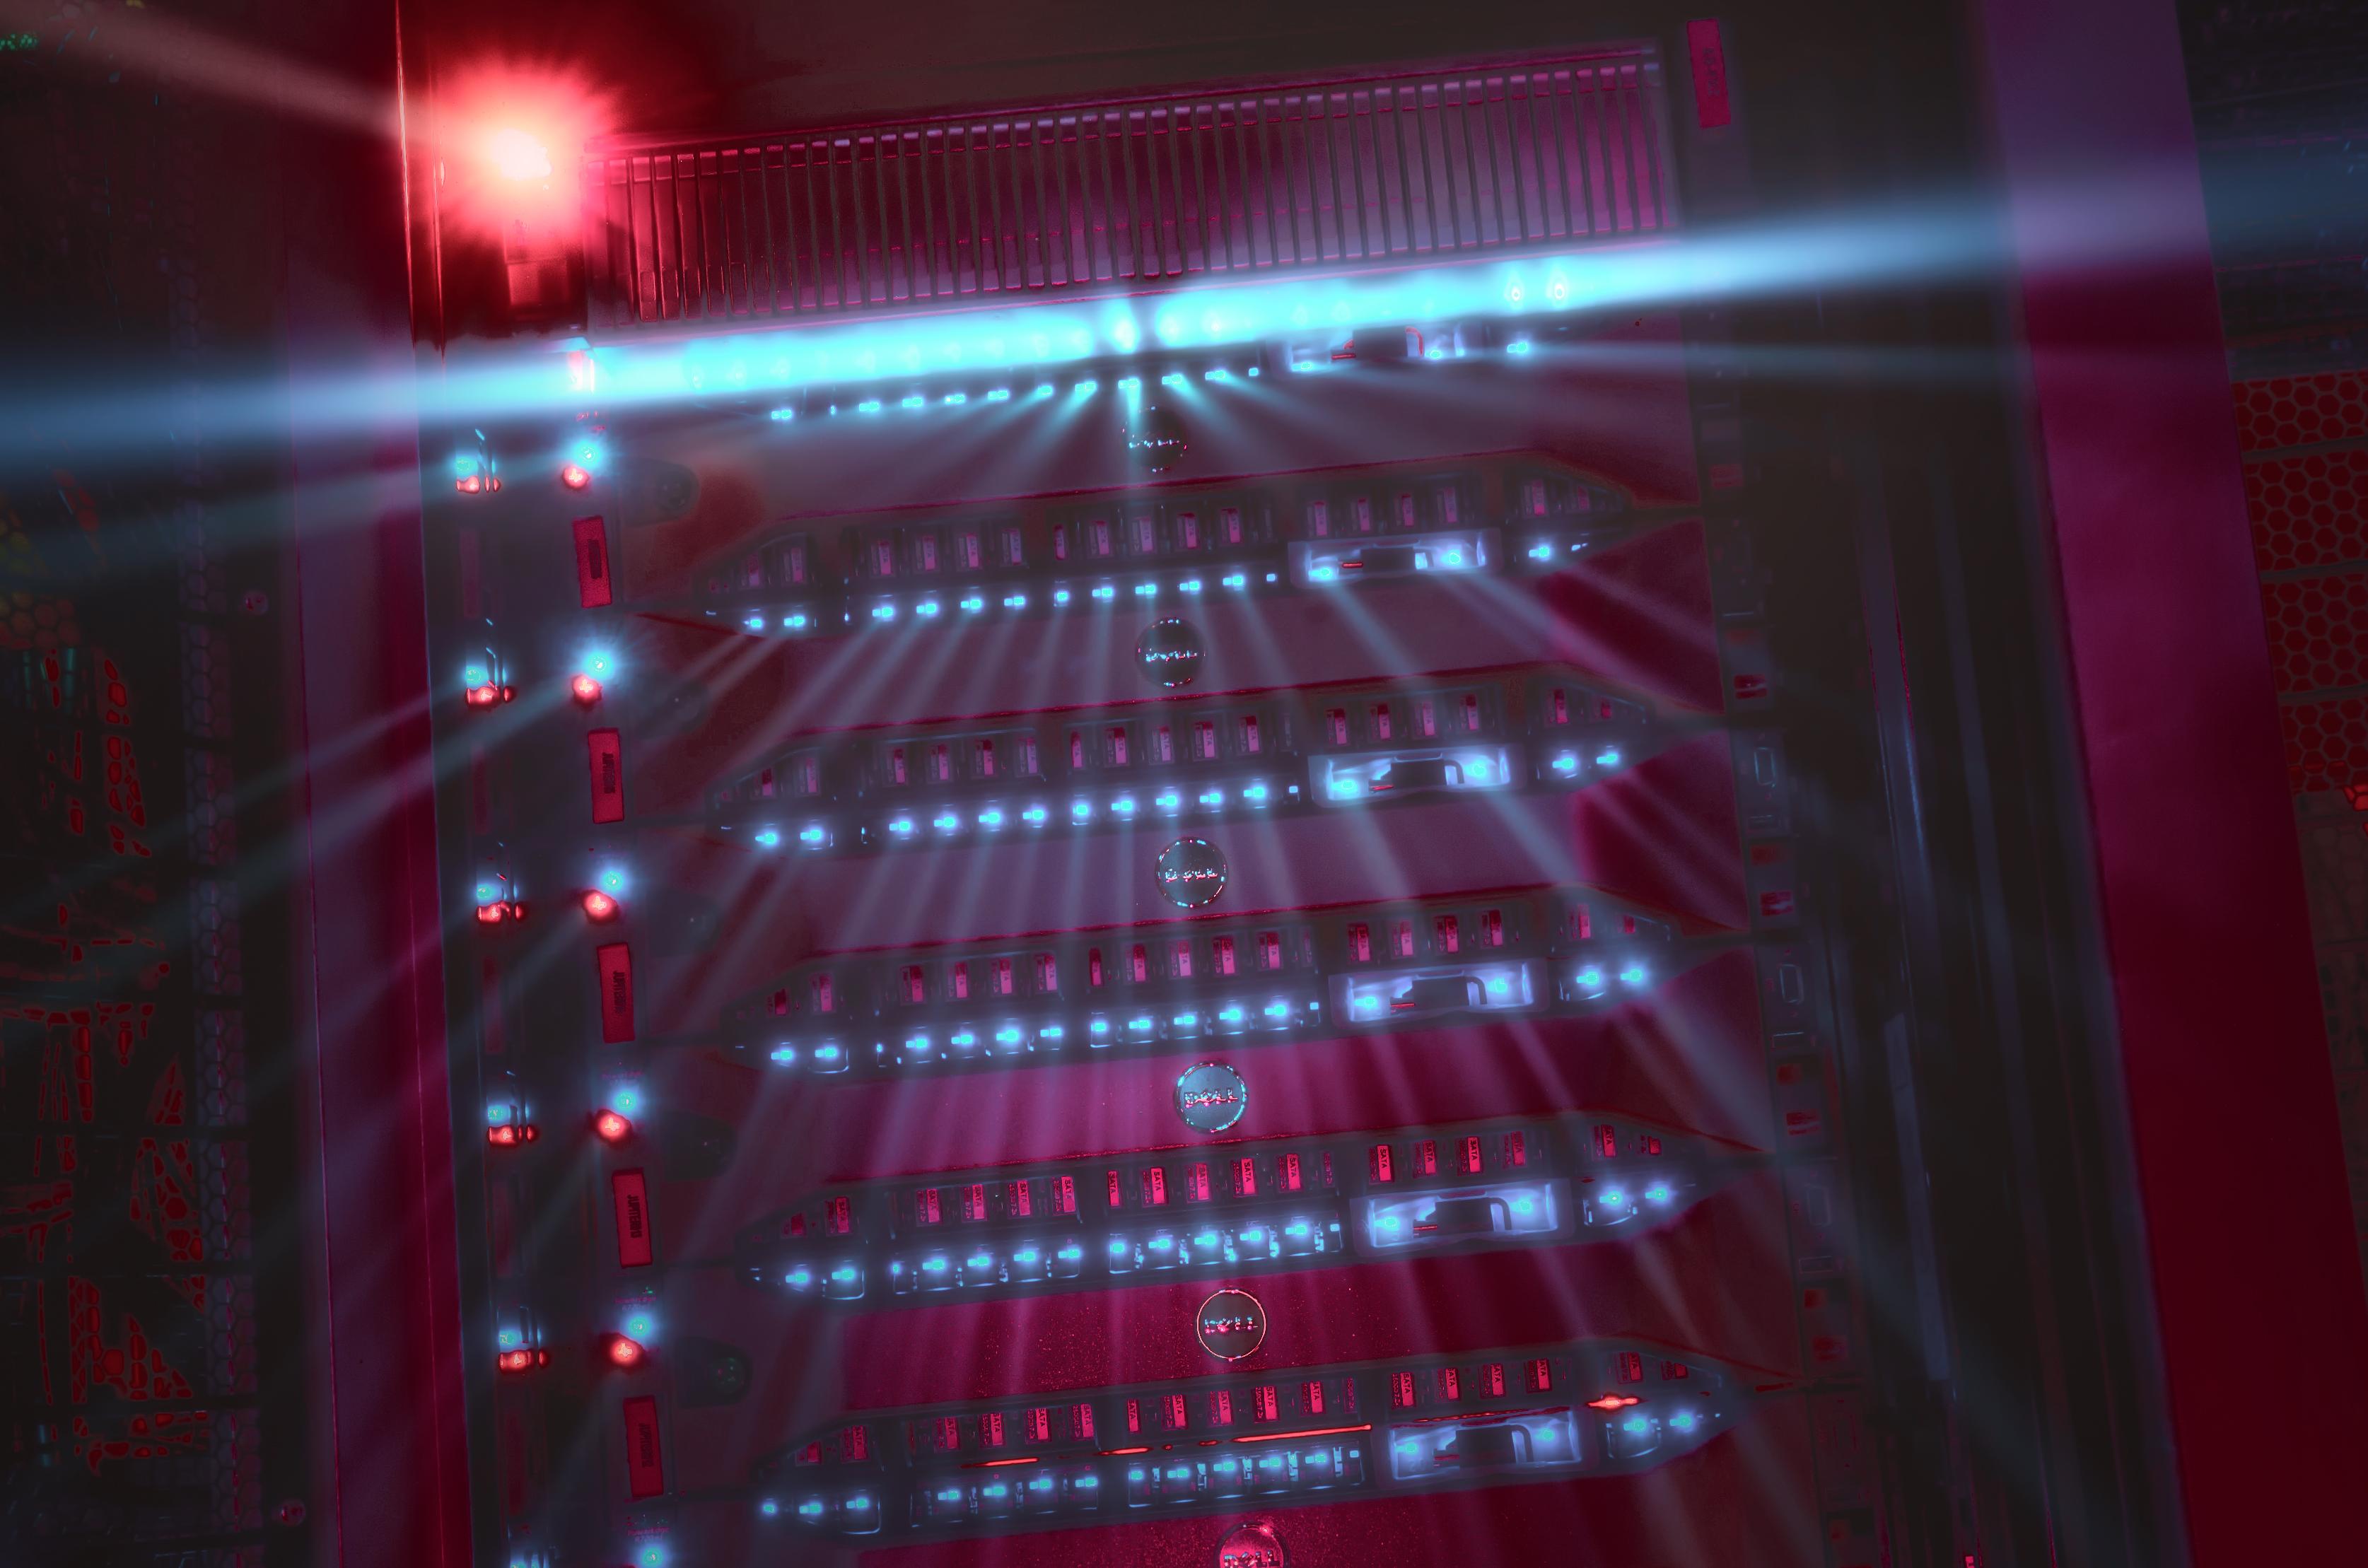 Storage Testing 2 million IOPS